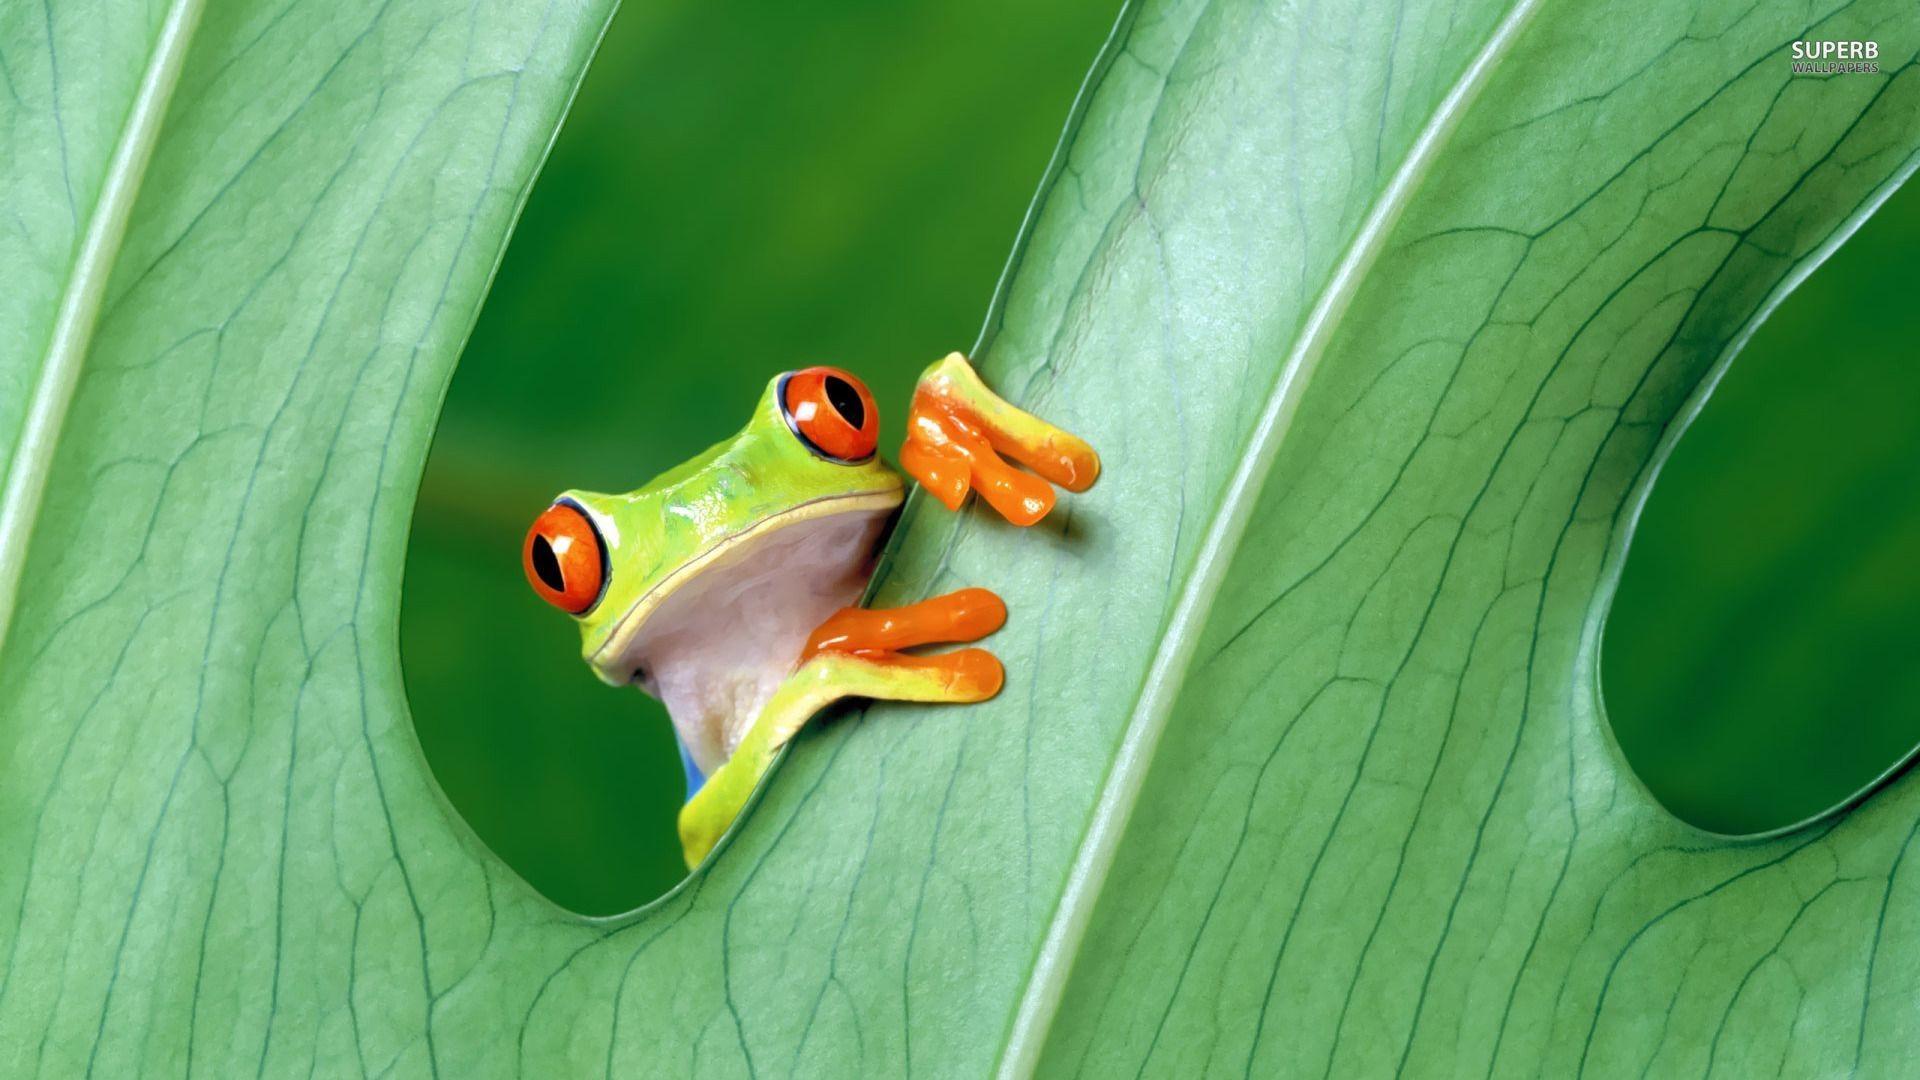 Kermit the frog wallpaper 53 images - Frog cartoon wallpaper ...